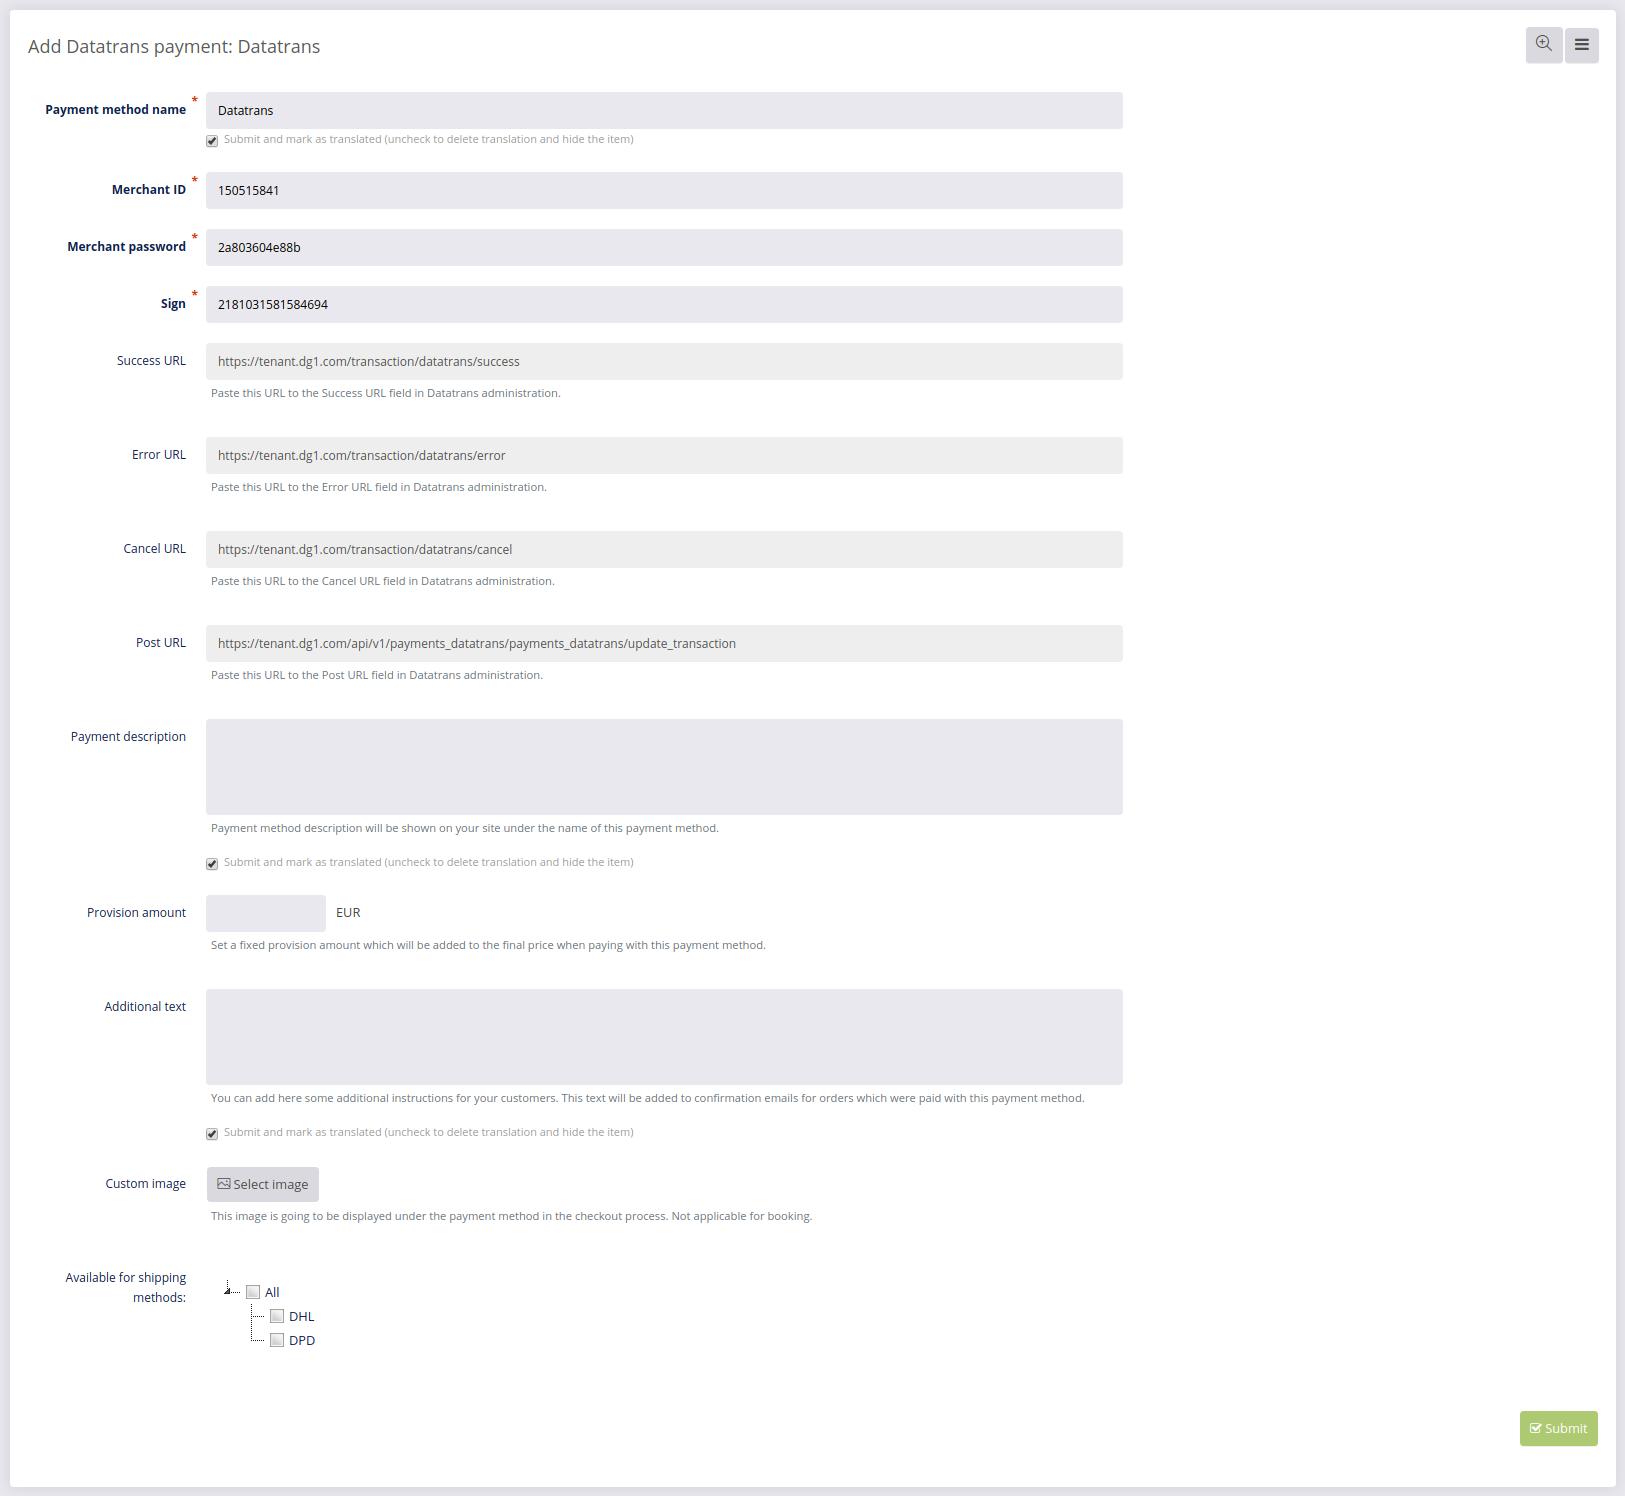 Datatrans_details